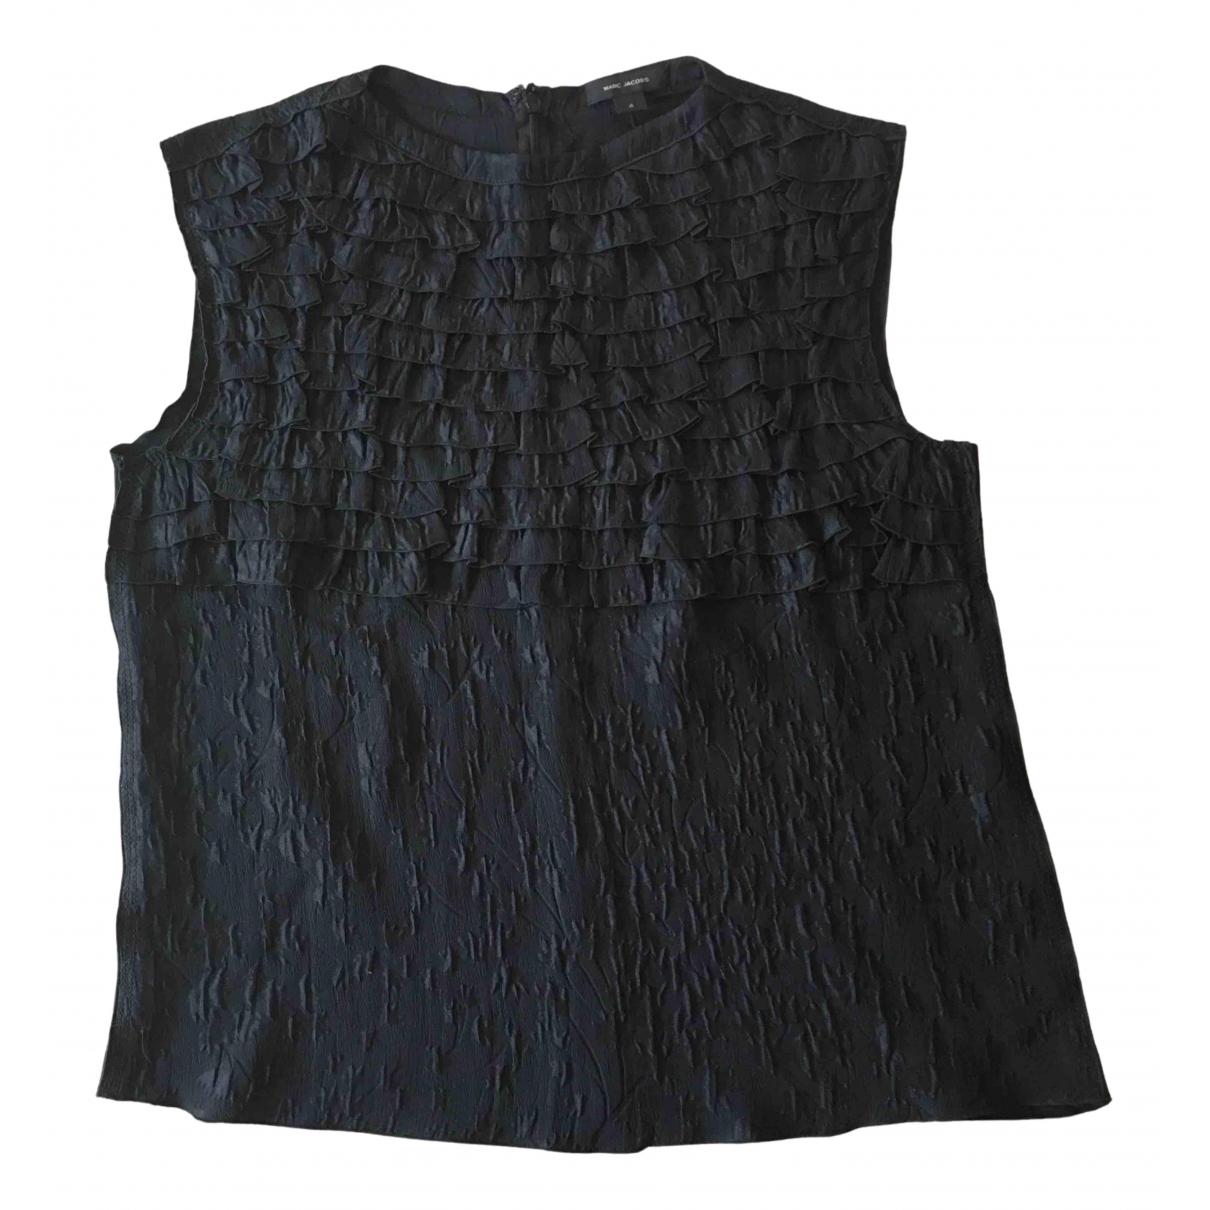 Camiseta sin mangas de Seda Marc Jacobs